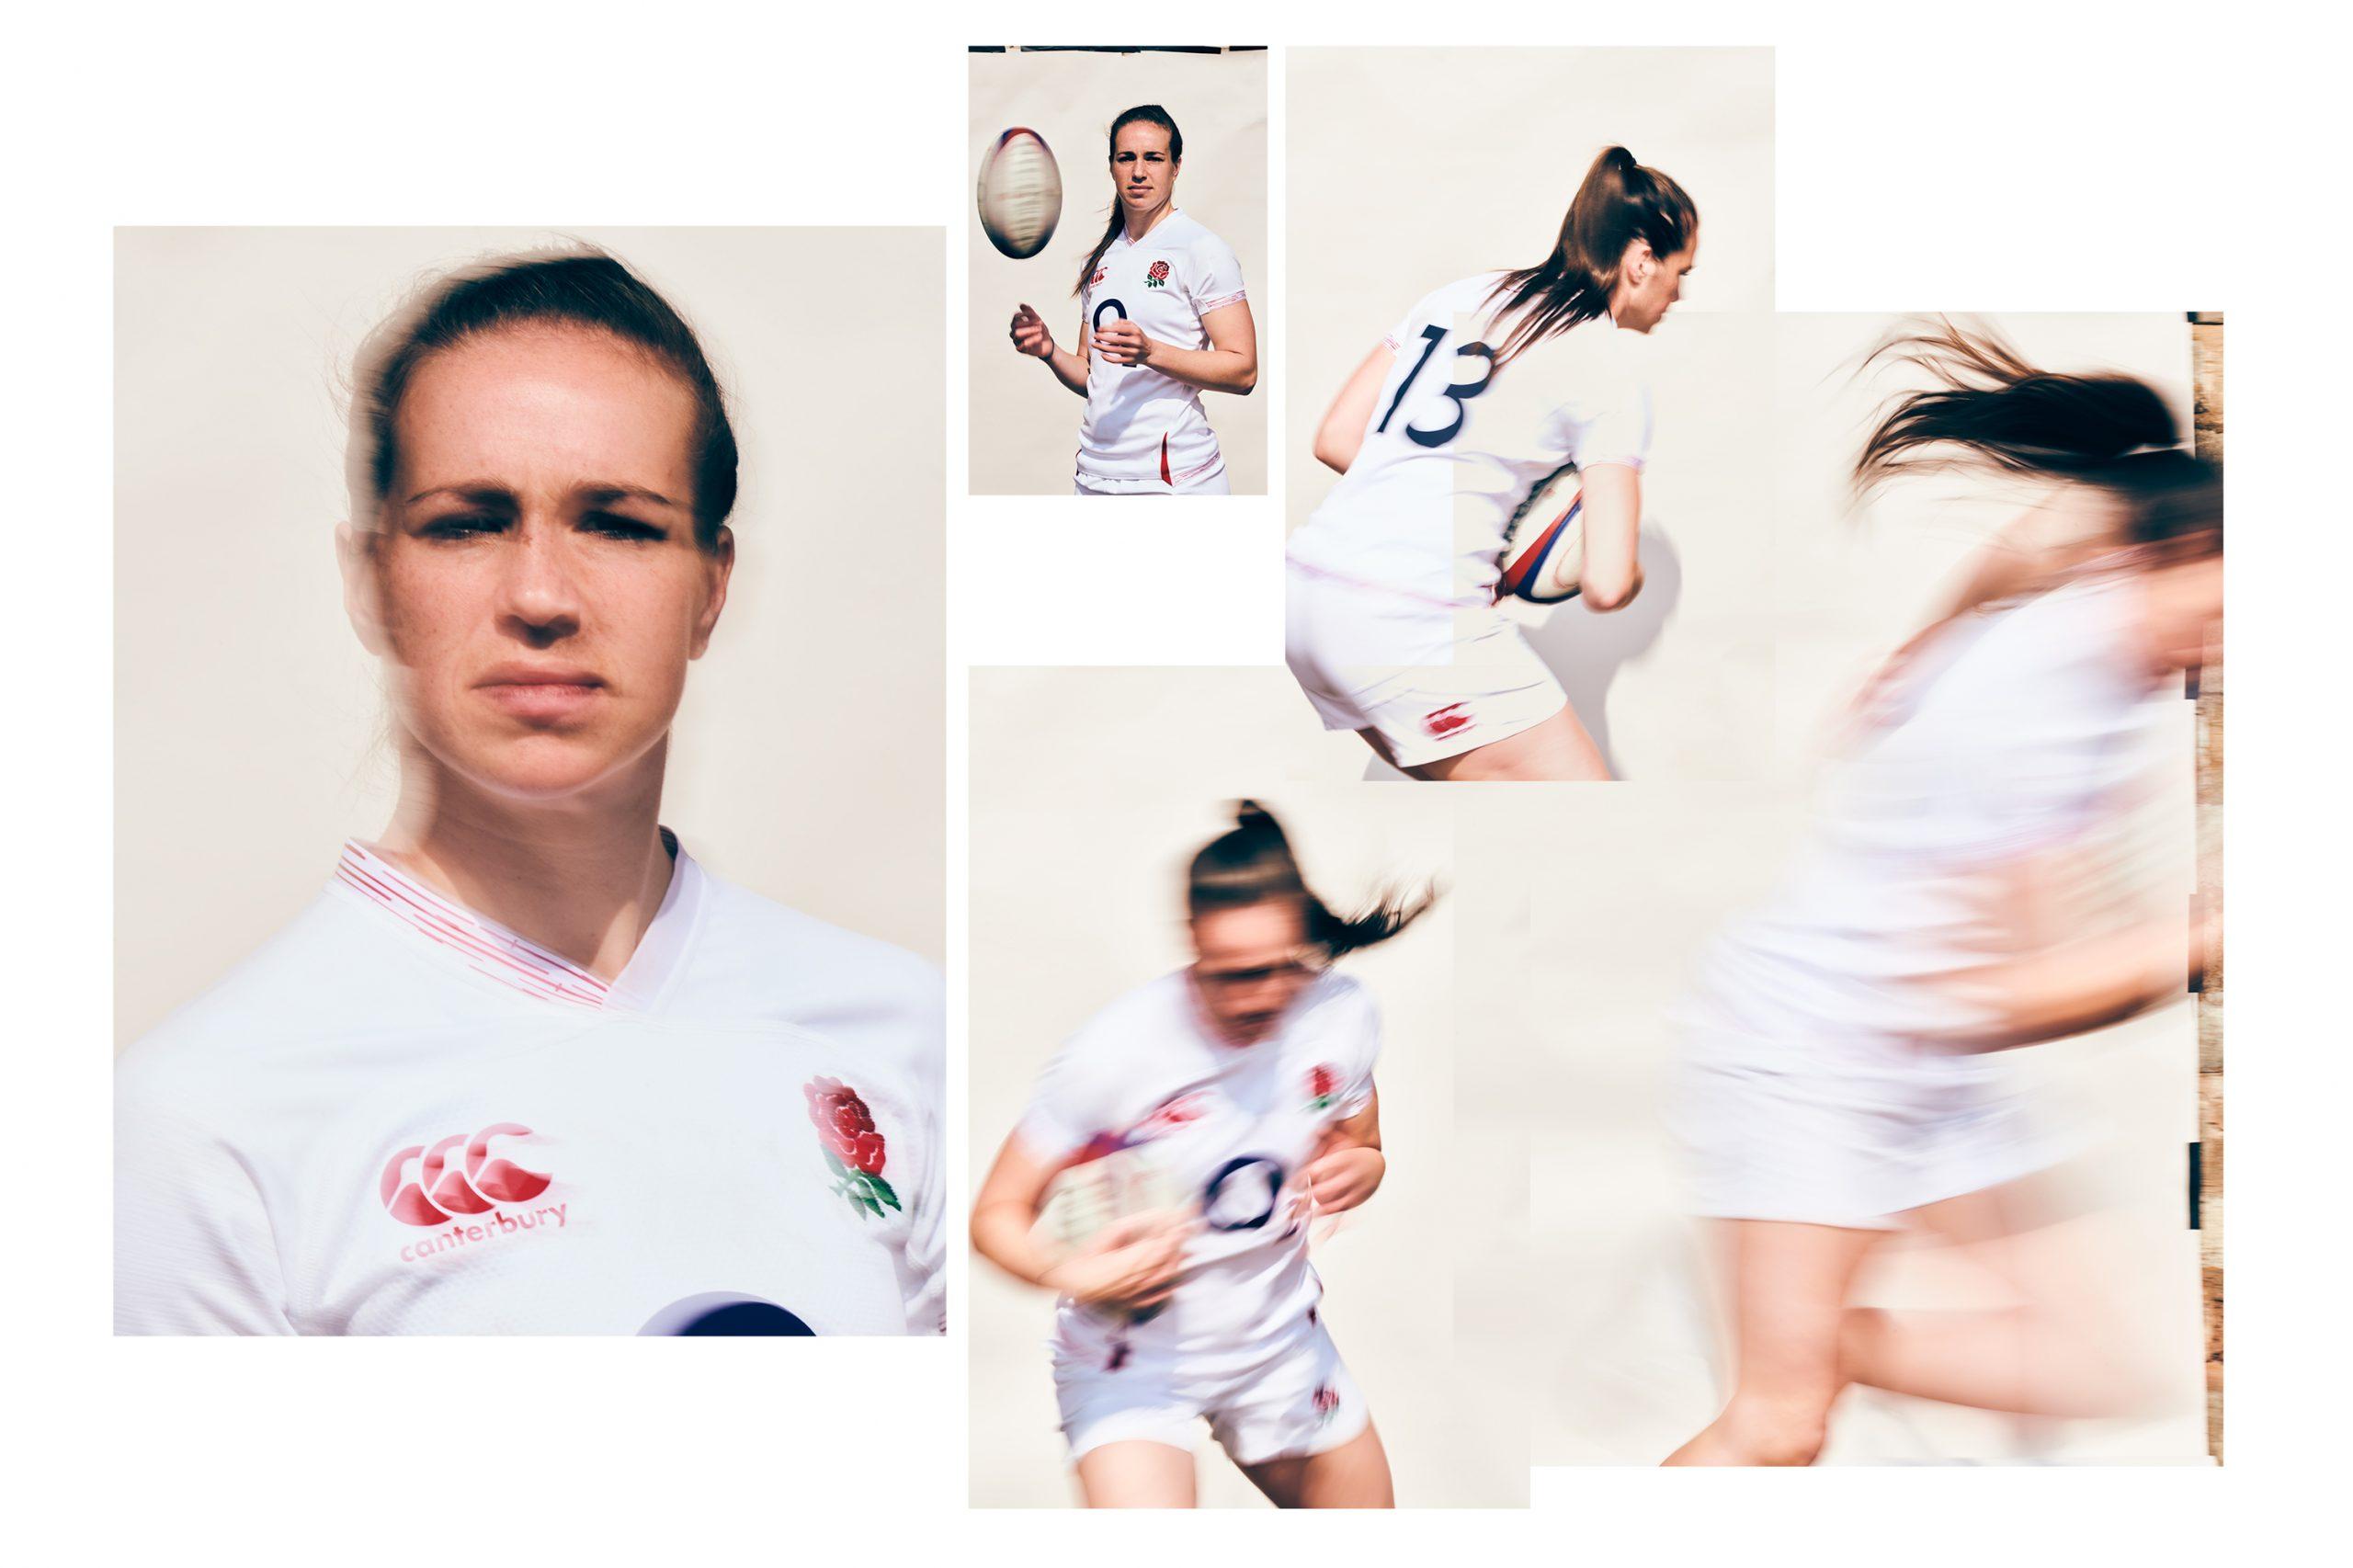 Rugby-Journal_Emily-Scarratt_Portrait_92992-group